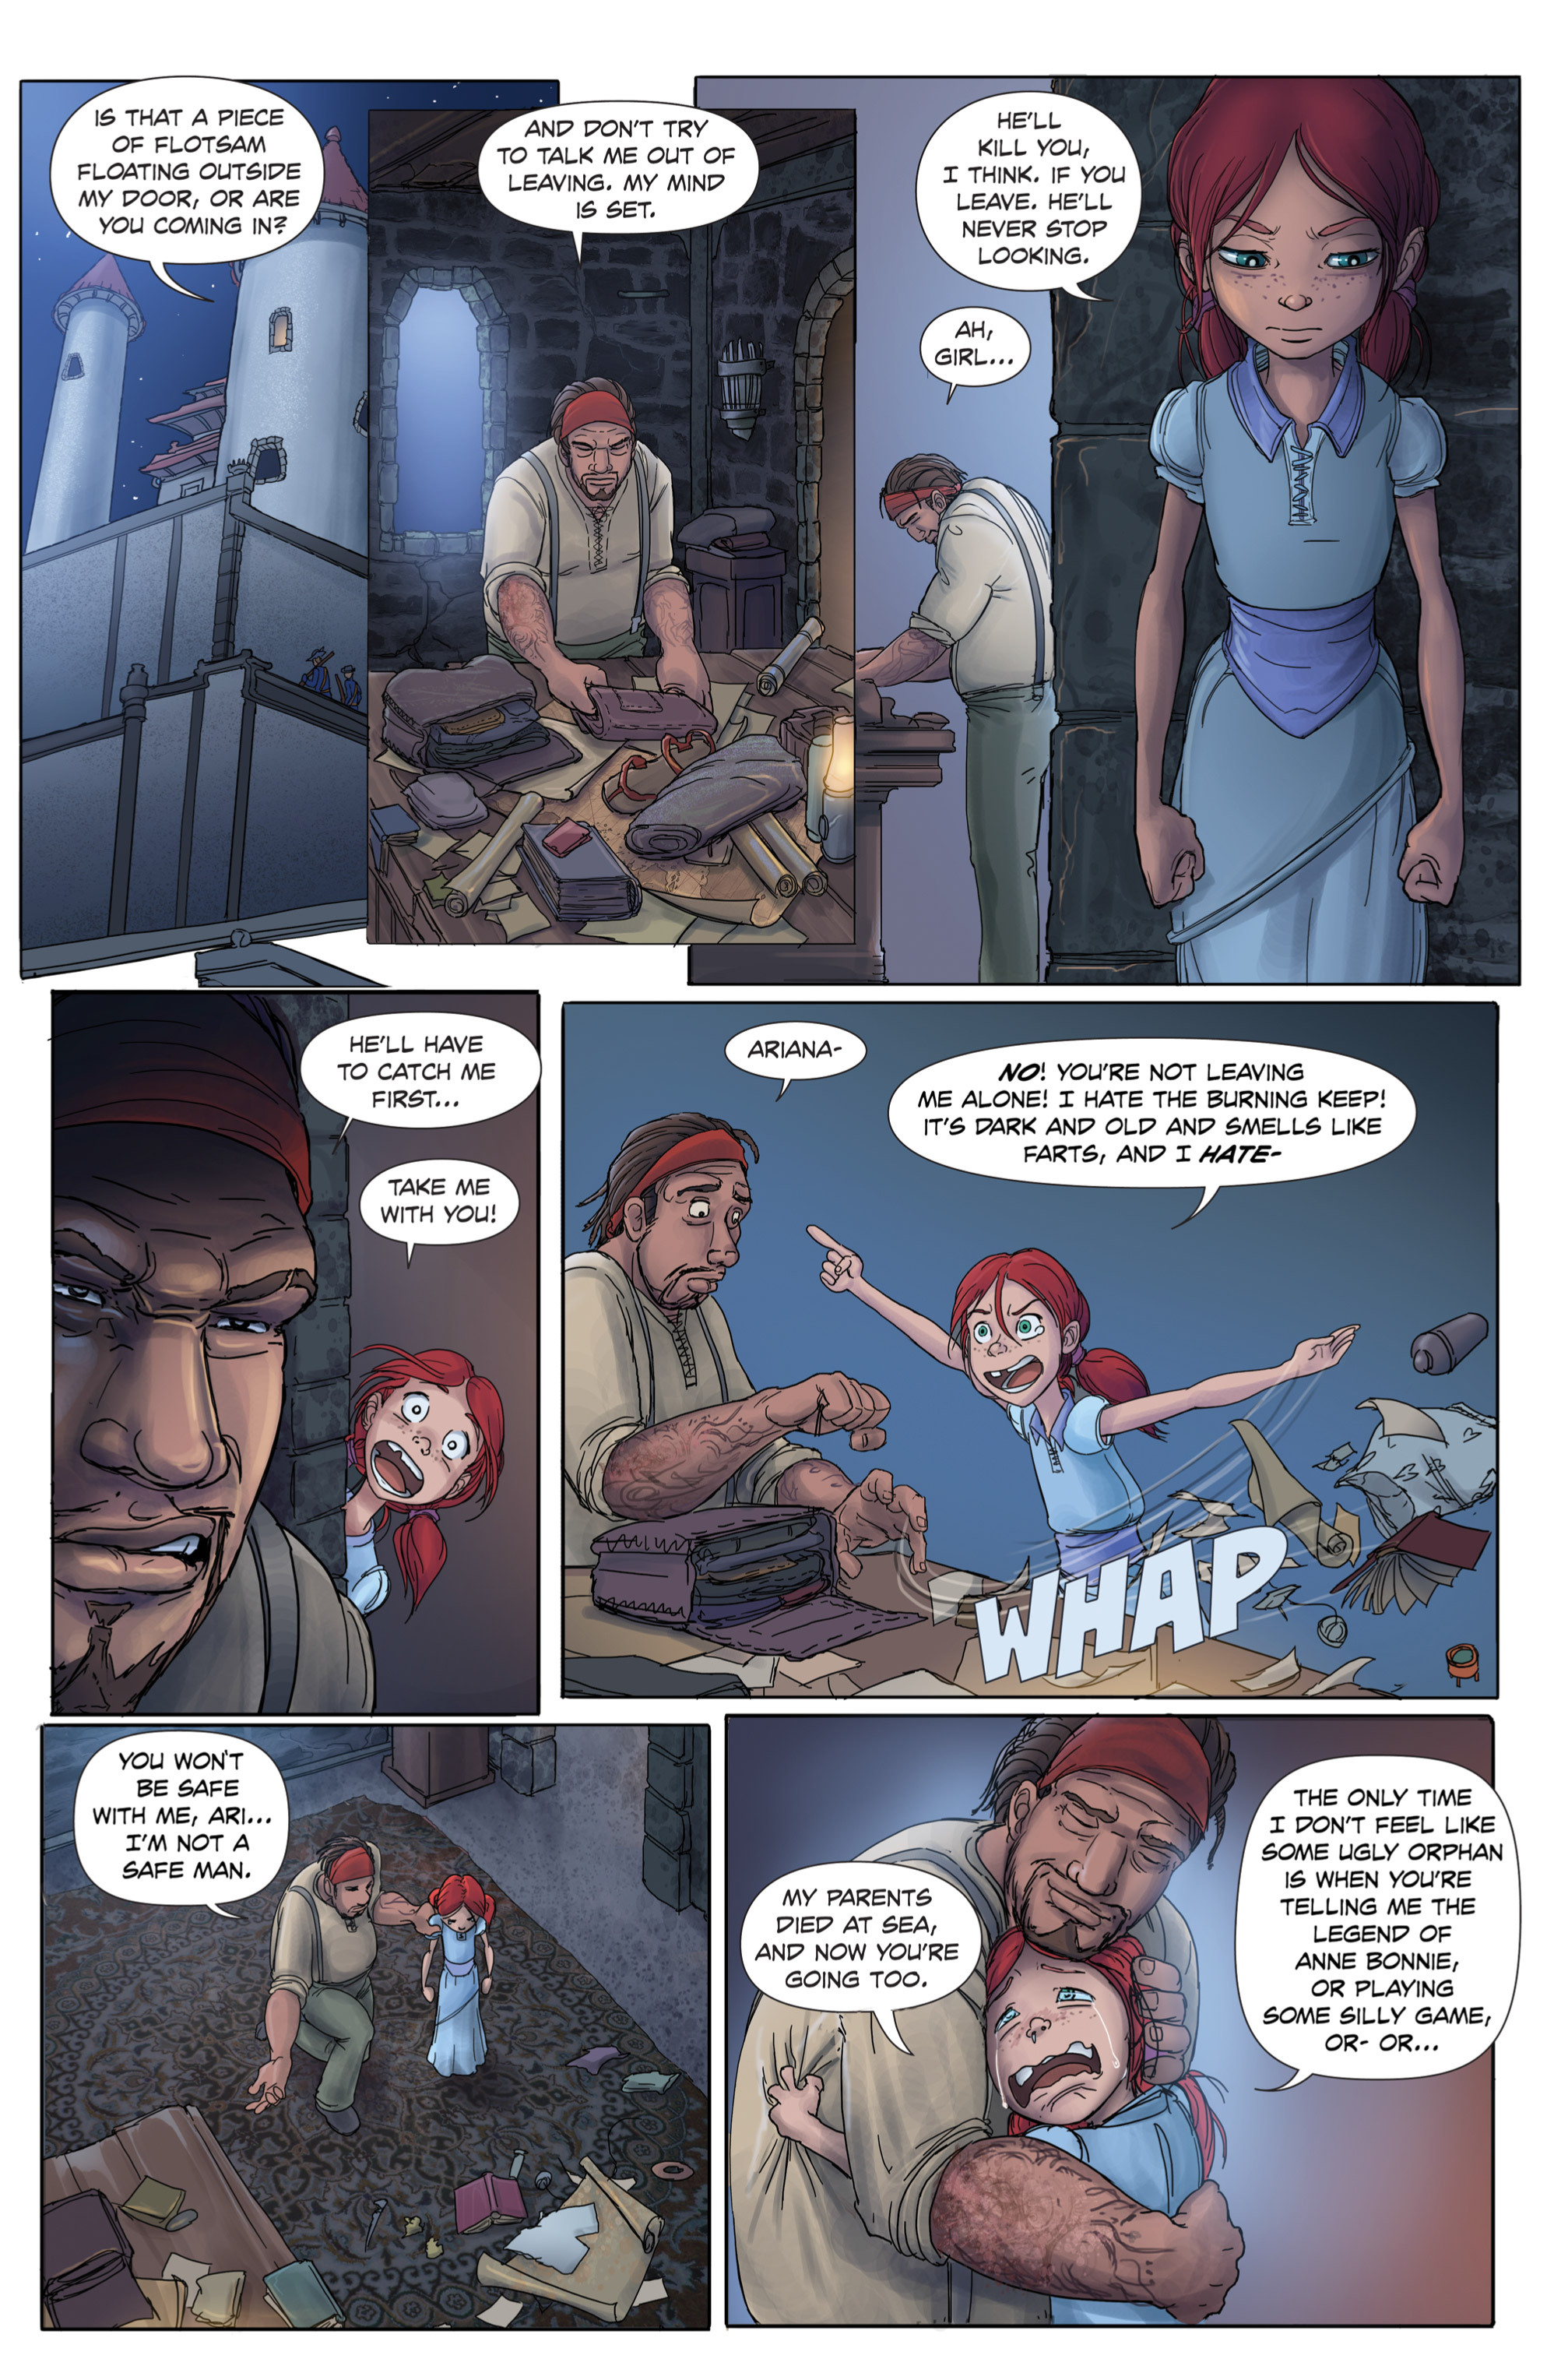 Read online Anne Bonnie comic -  Issue #1 - 9